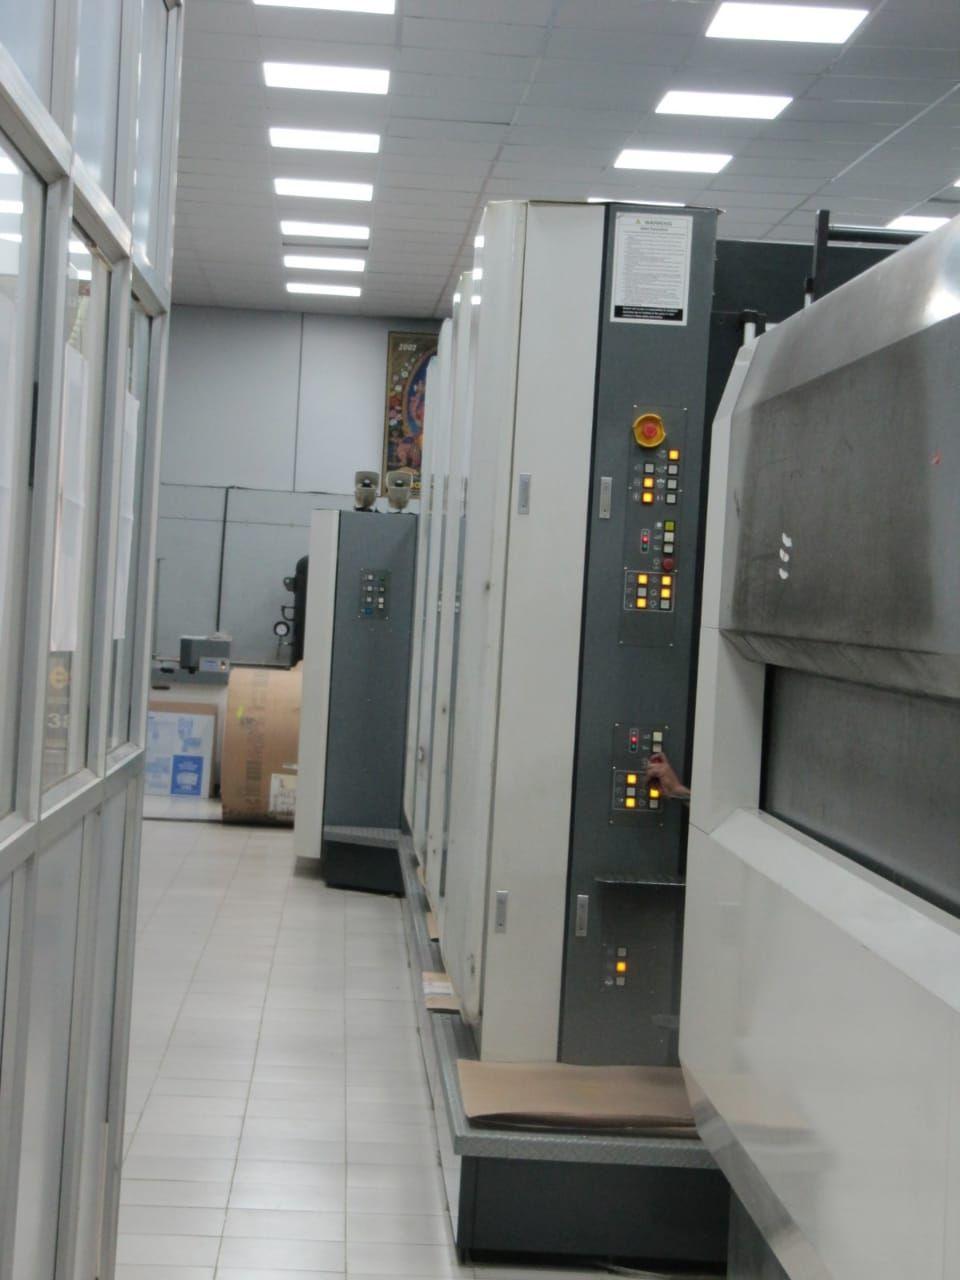 KOMORI SYSTEM 38 S, Jahr : 2011, ref.68788 | www.coci-sa.com/de | 68788n_15.jpg